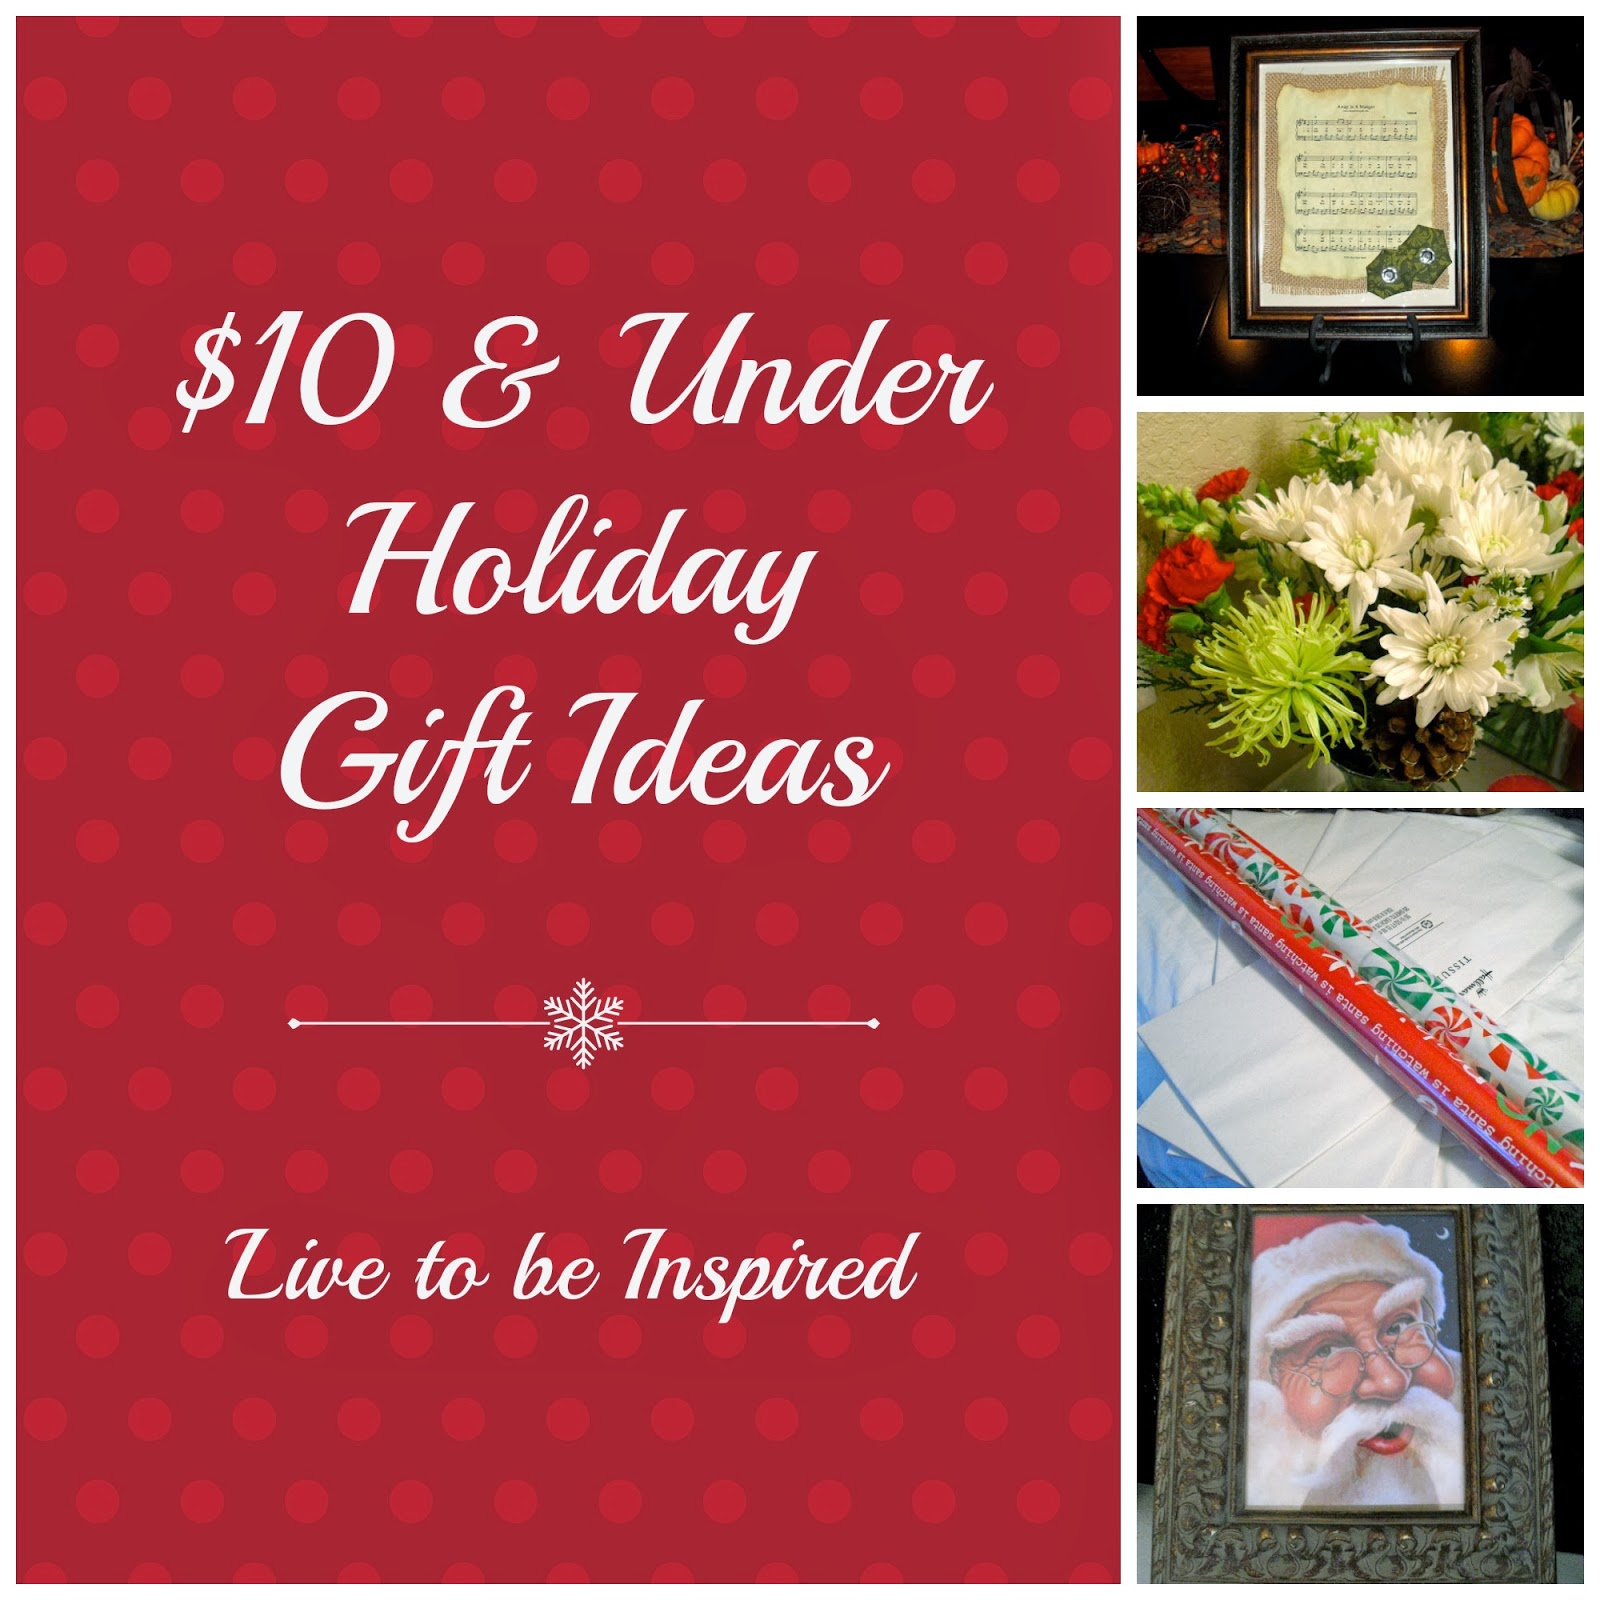 Crafty Night Owls: Christmas Series Day 14 - $10 & Under ...